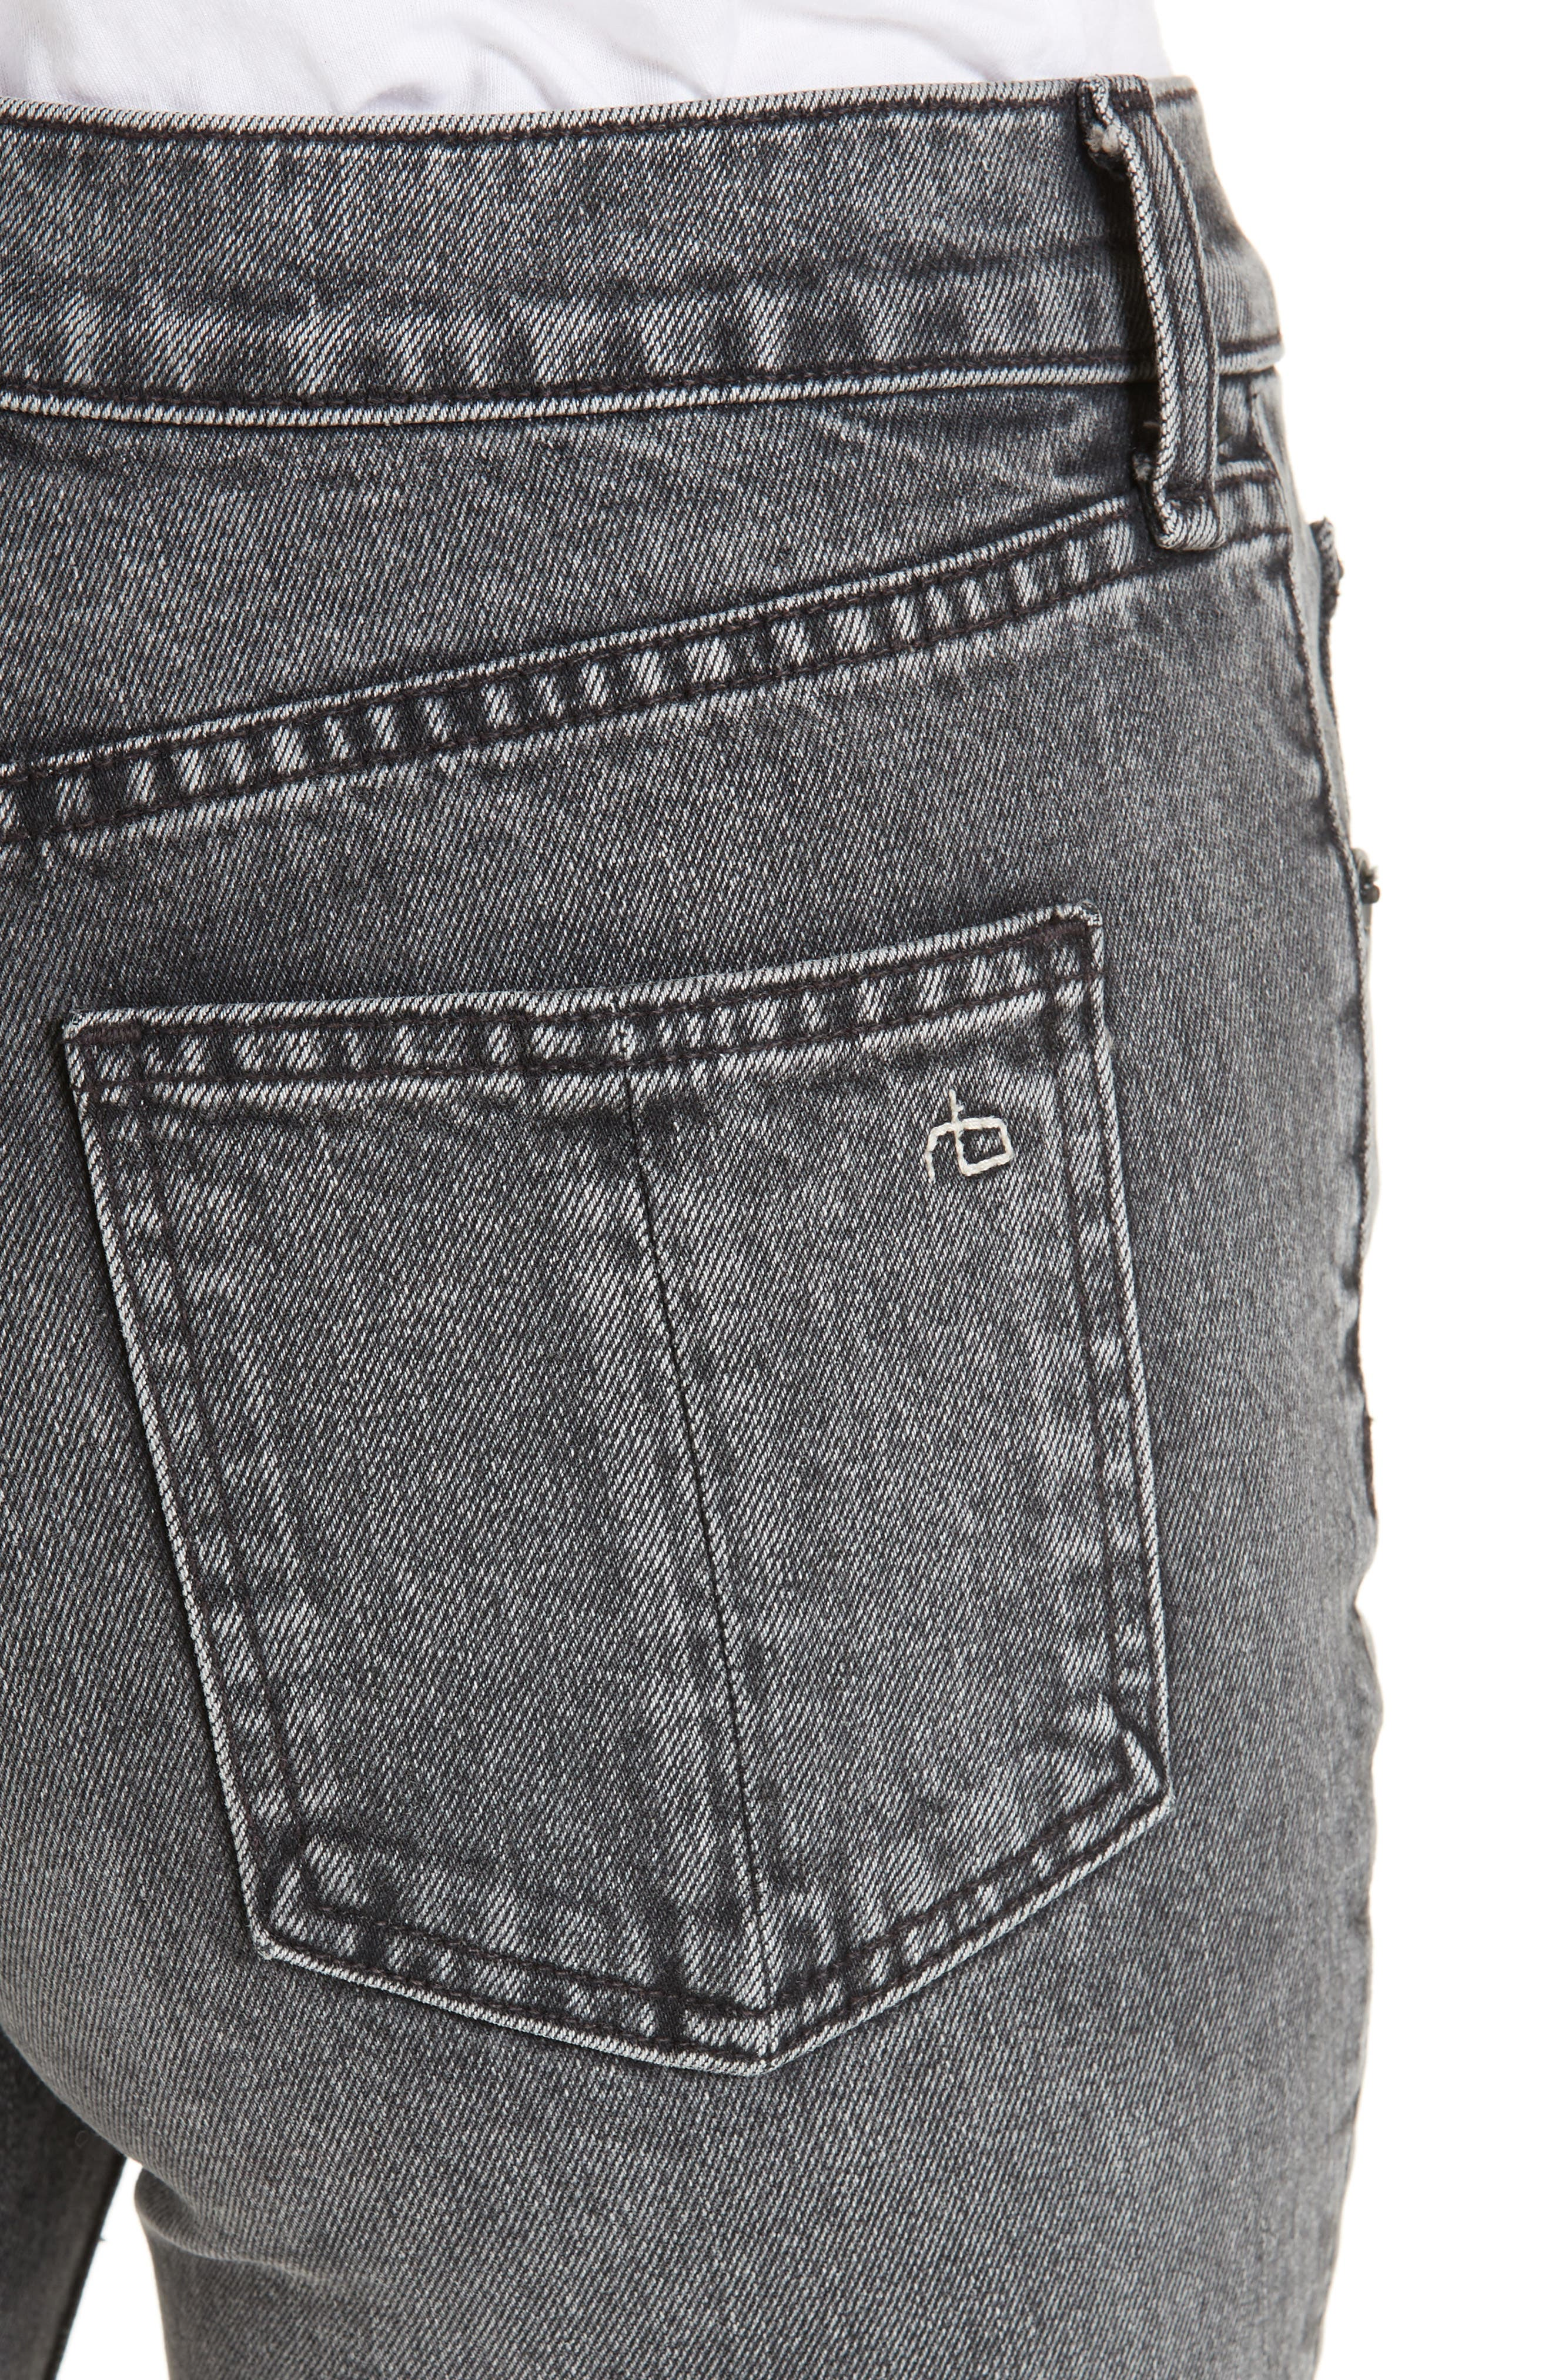 Hana Crop Kick Flare Jeans,                             Alternate thumbnail 4, color,                             010